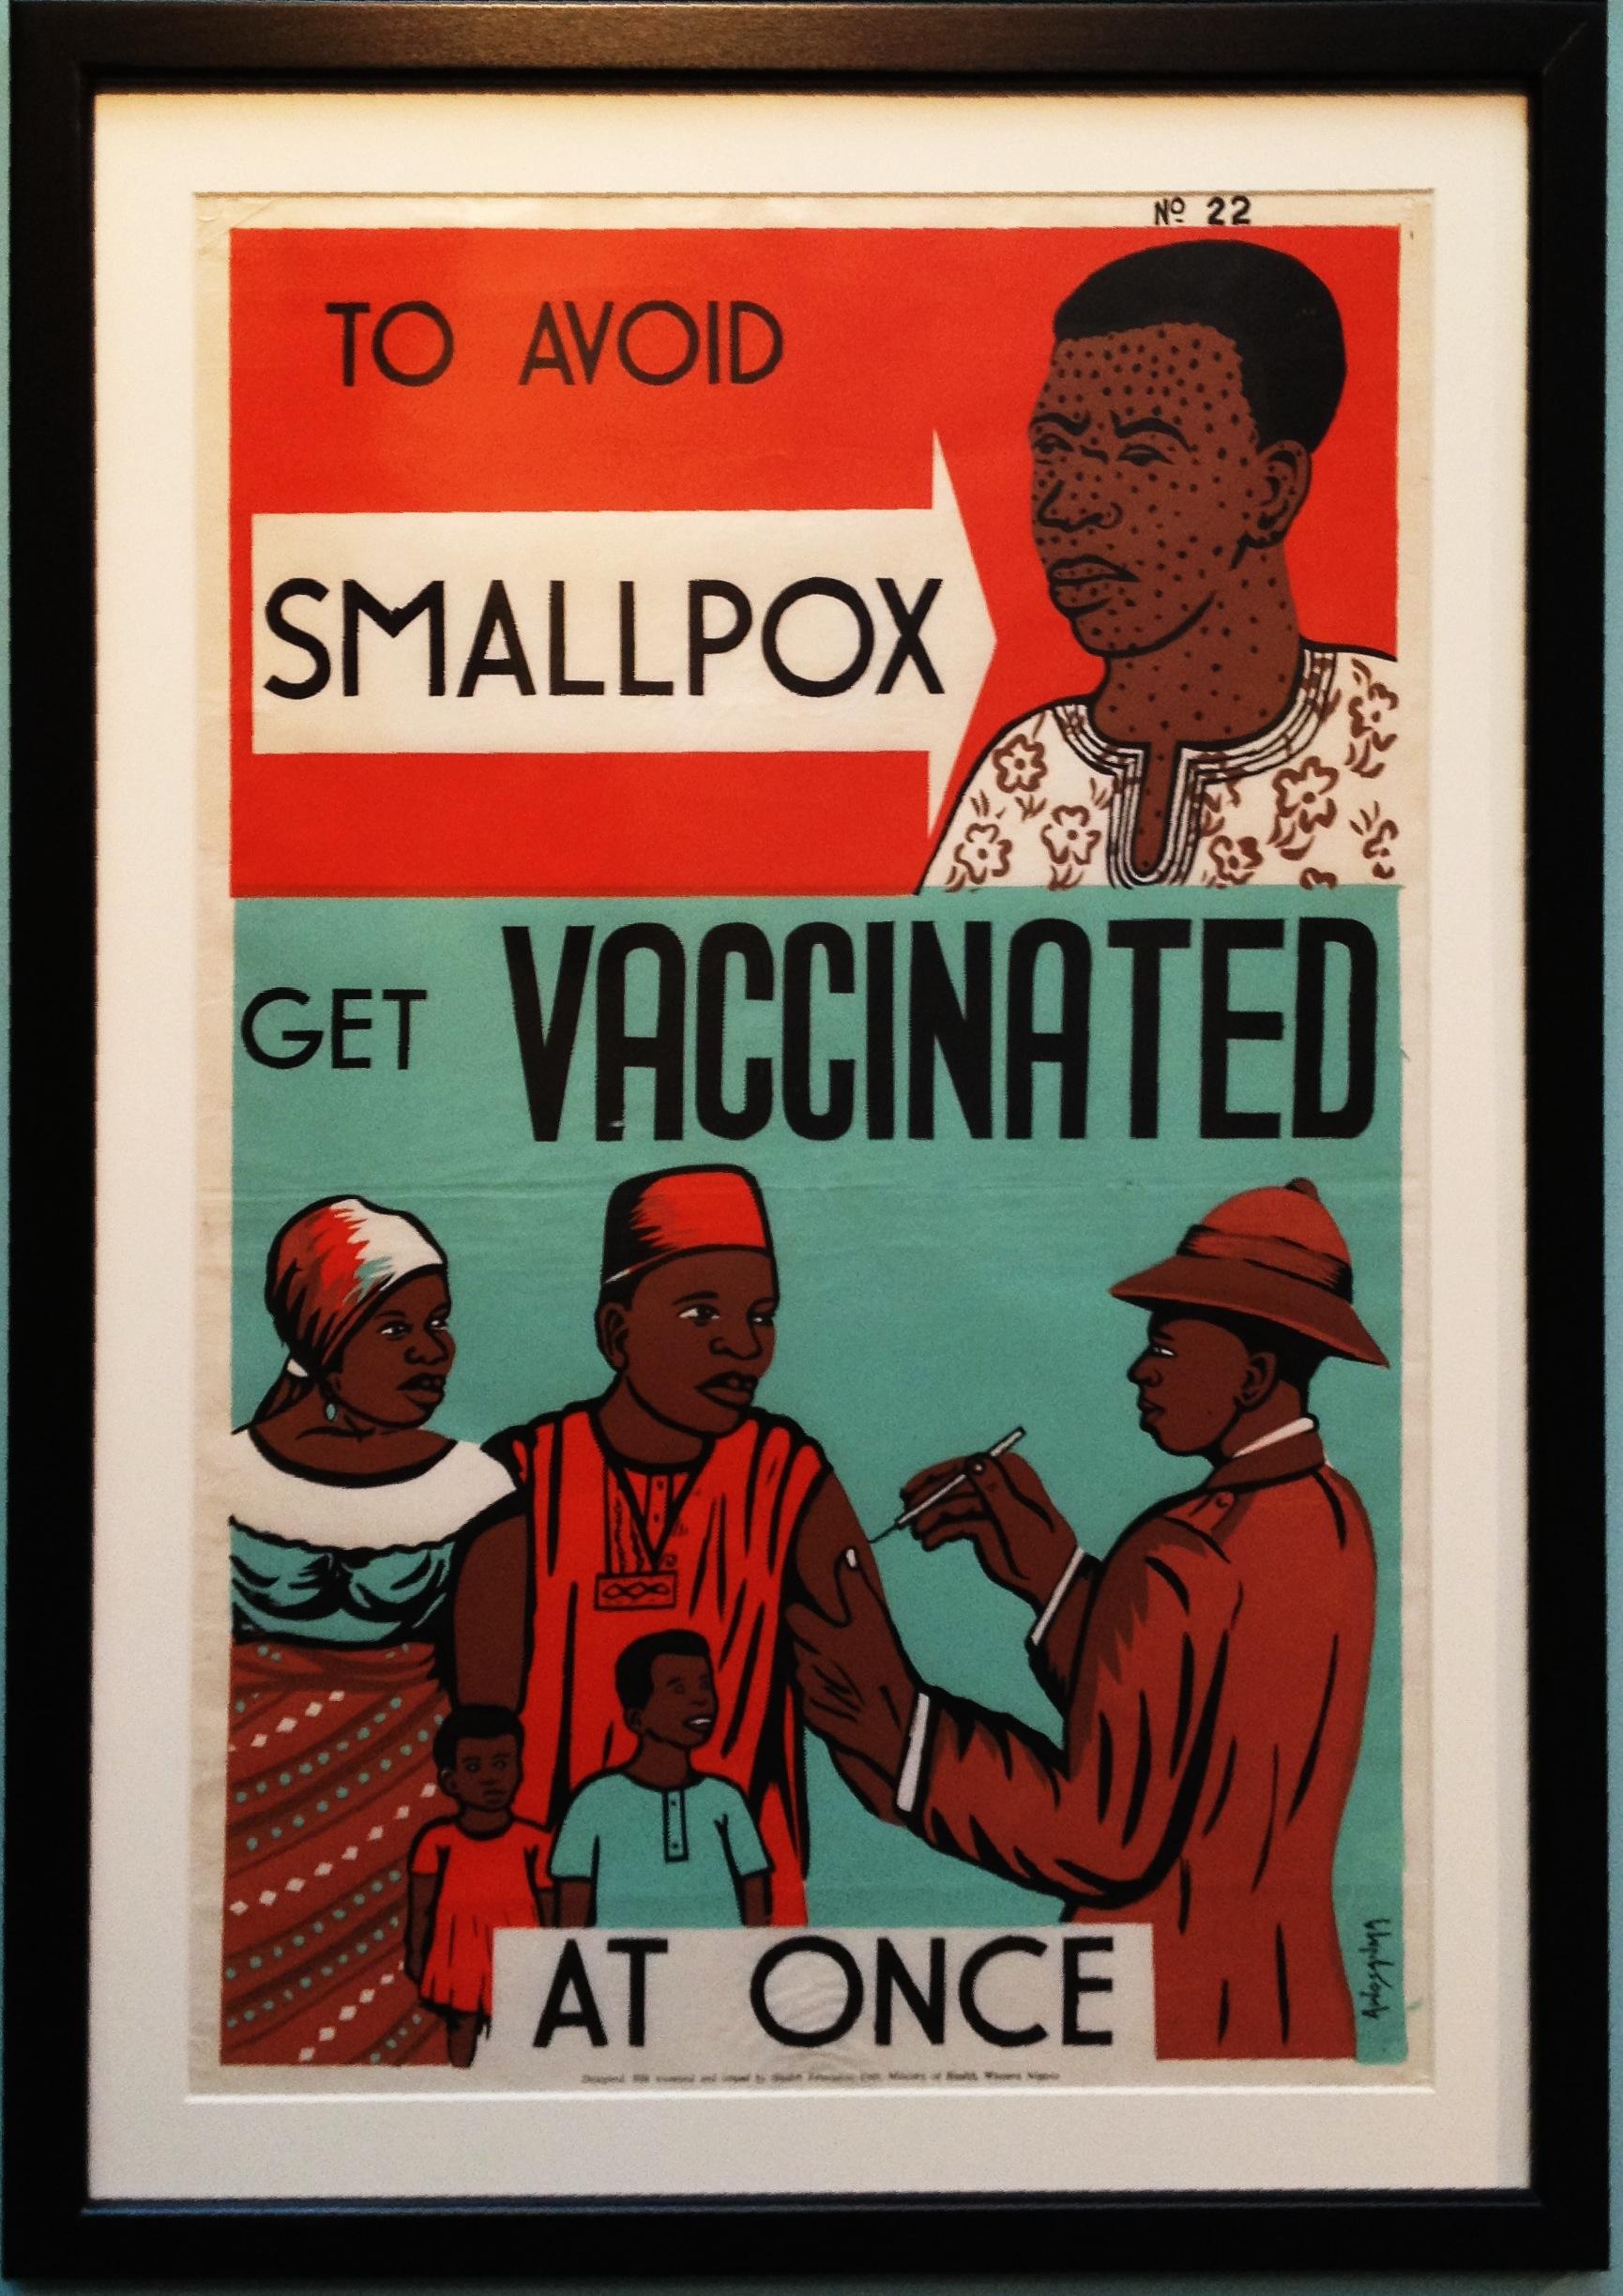 CDC smallpox poster 1